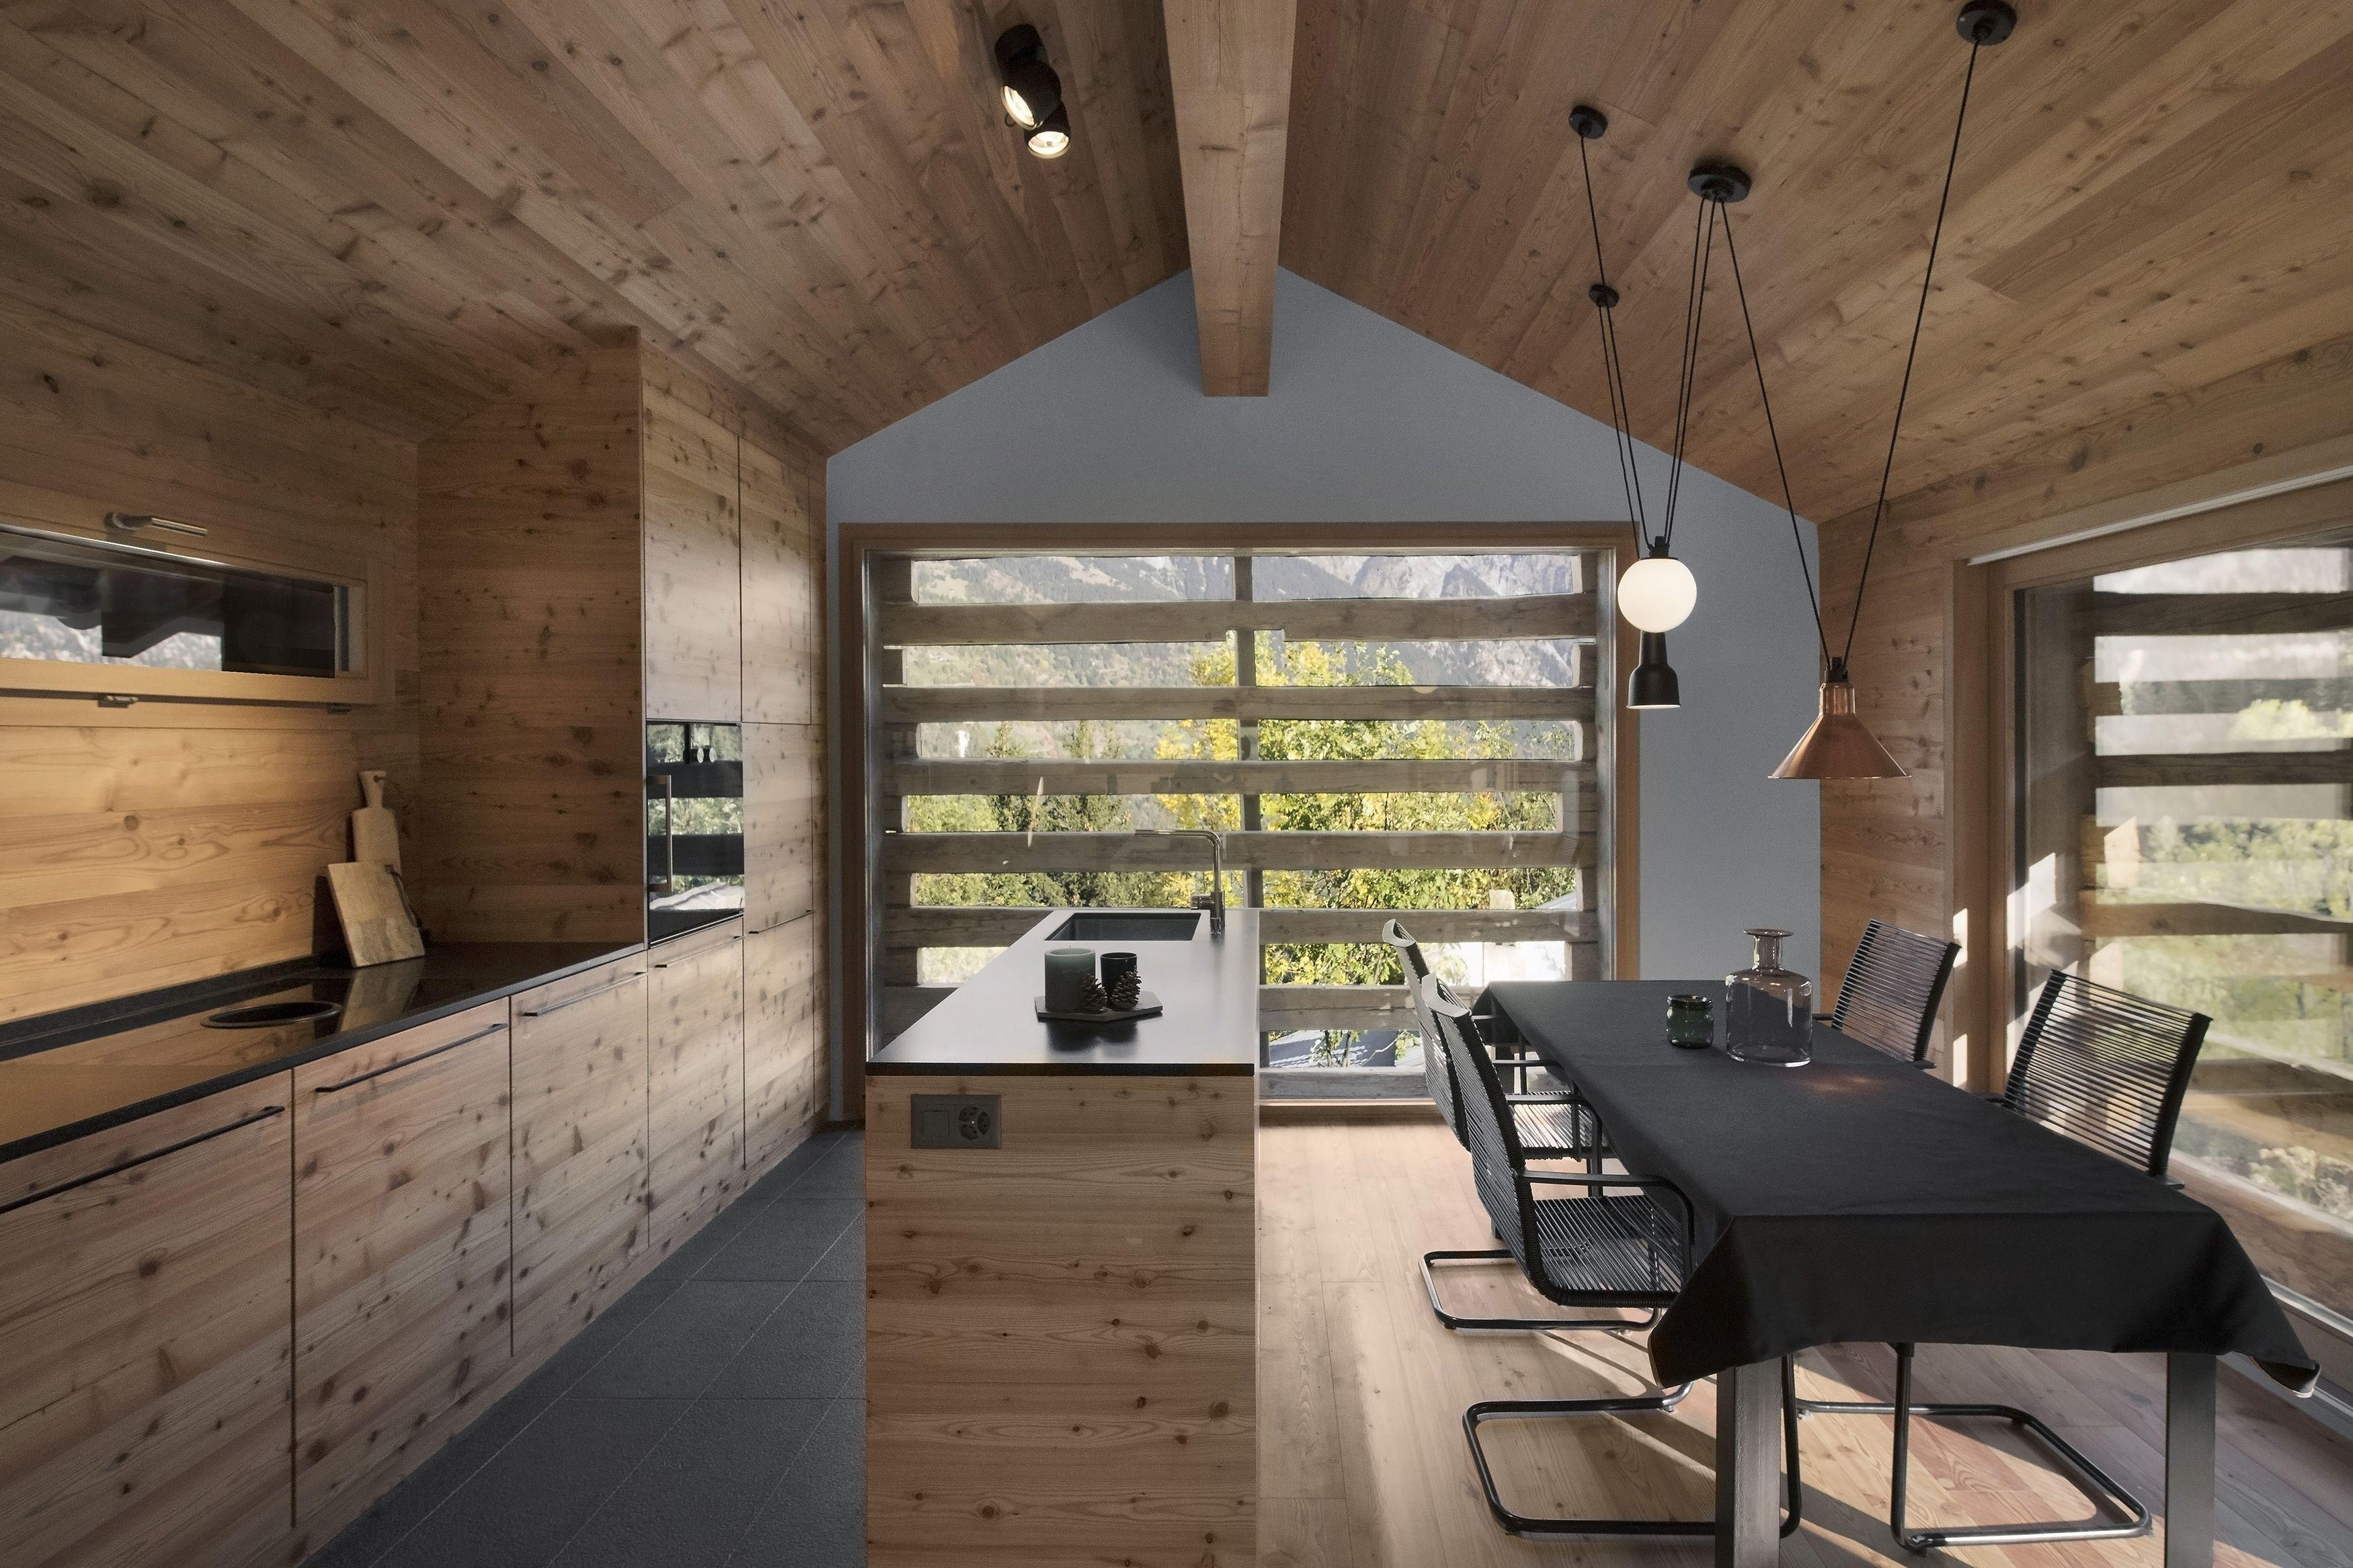 Spirit Of Mayen Haus Design Stall Umbau Wohnen